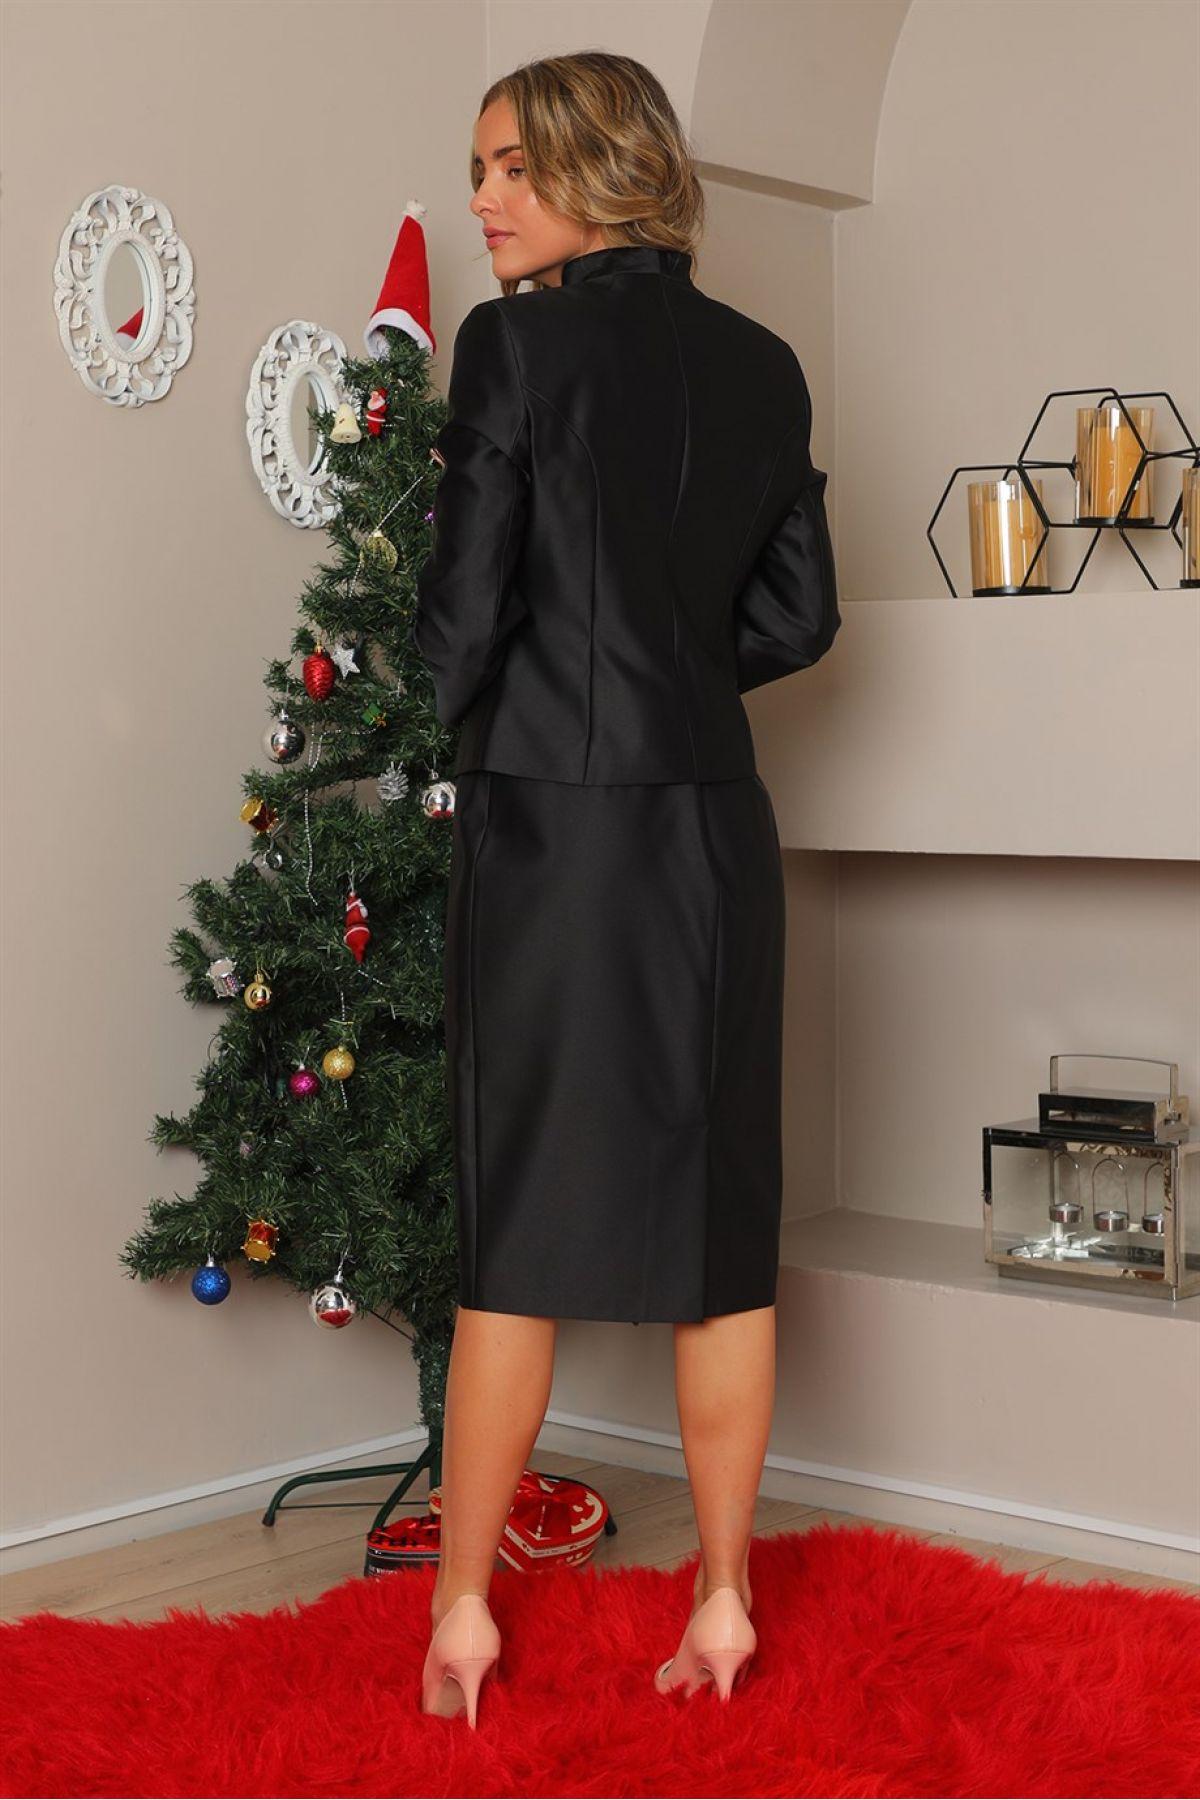 Jacket and Skirt-Black